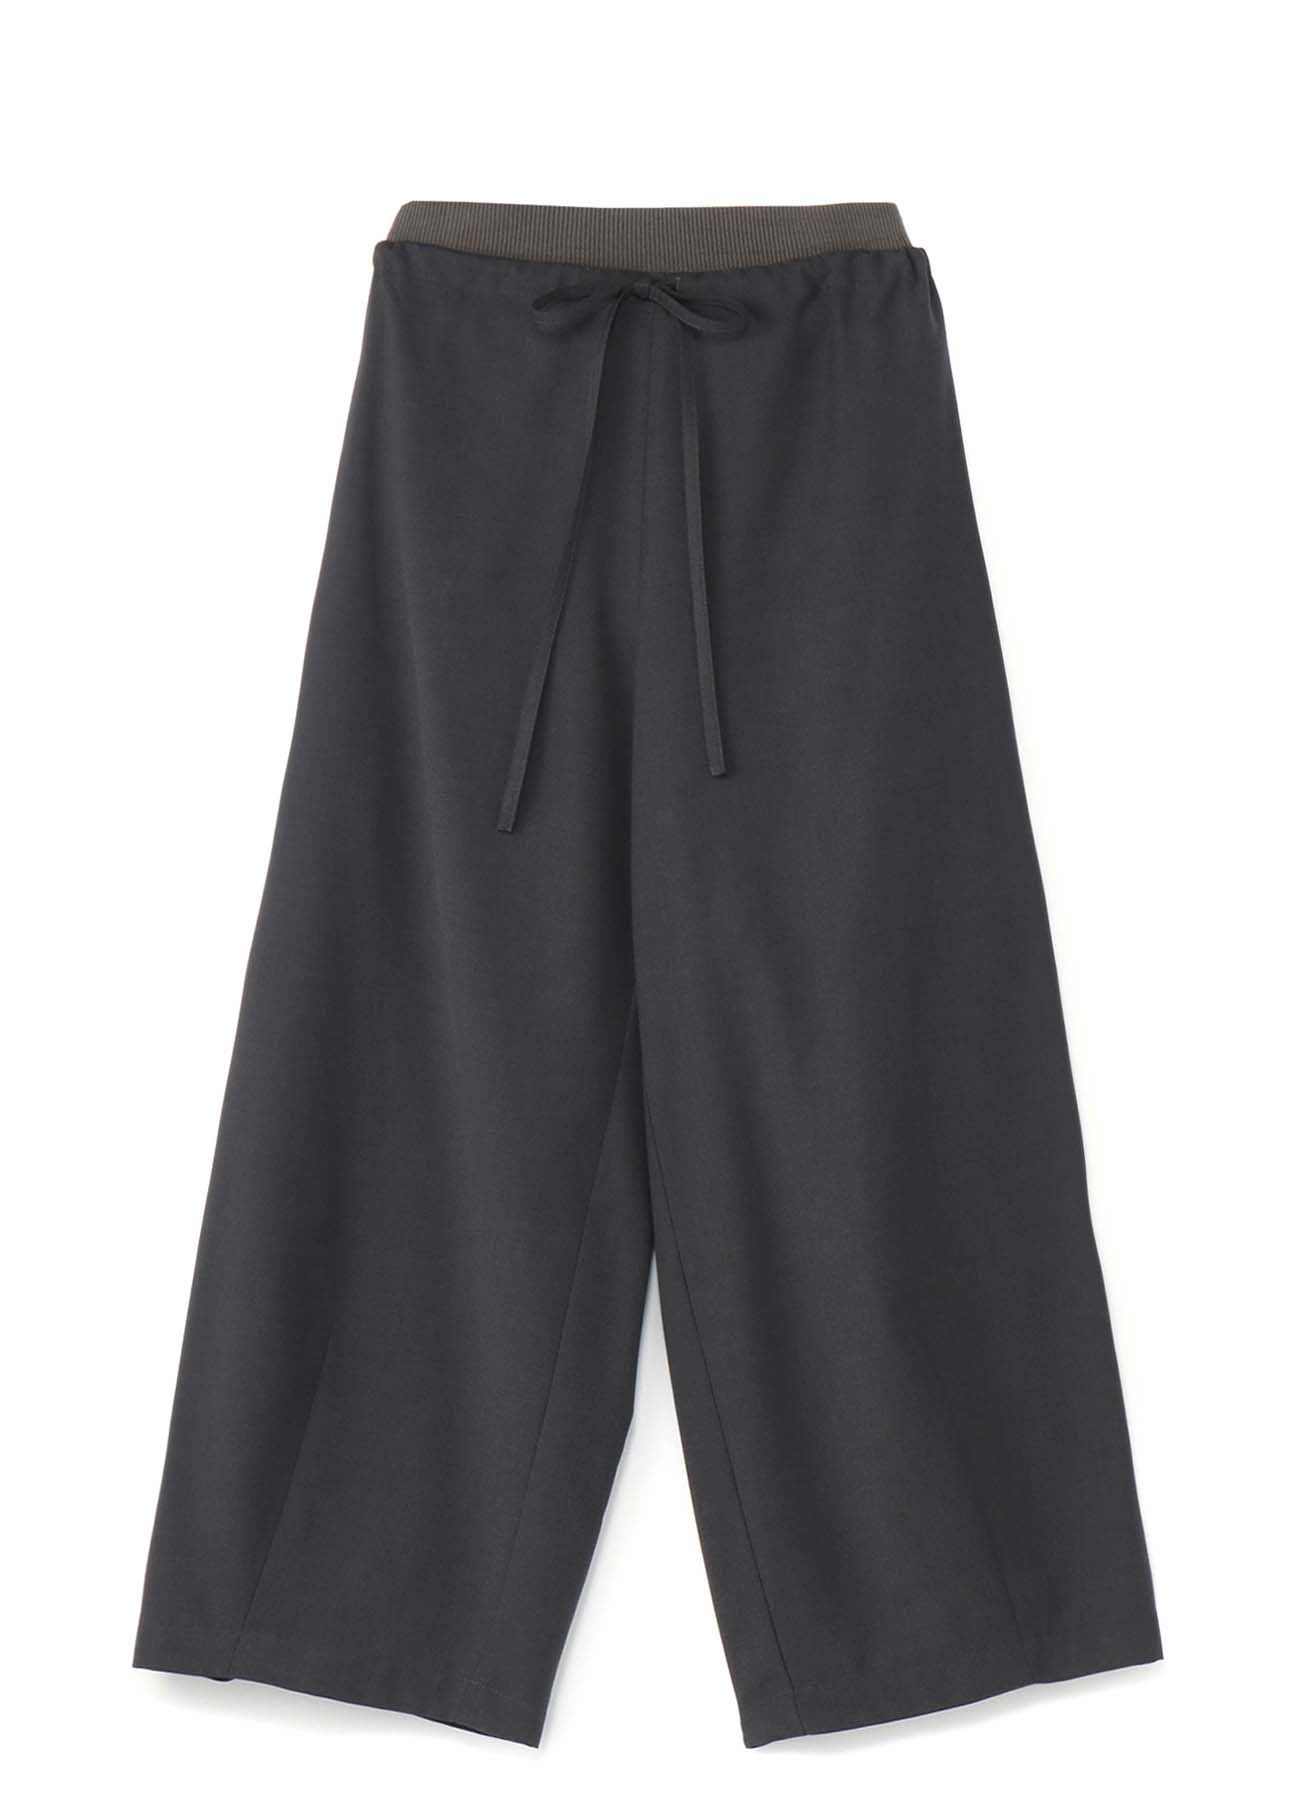 RISMATby Y's聚酯人造丝清楚斜纹腰围裁剪裤与肋